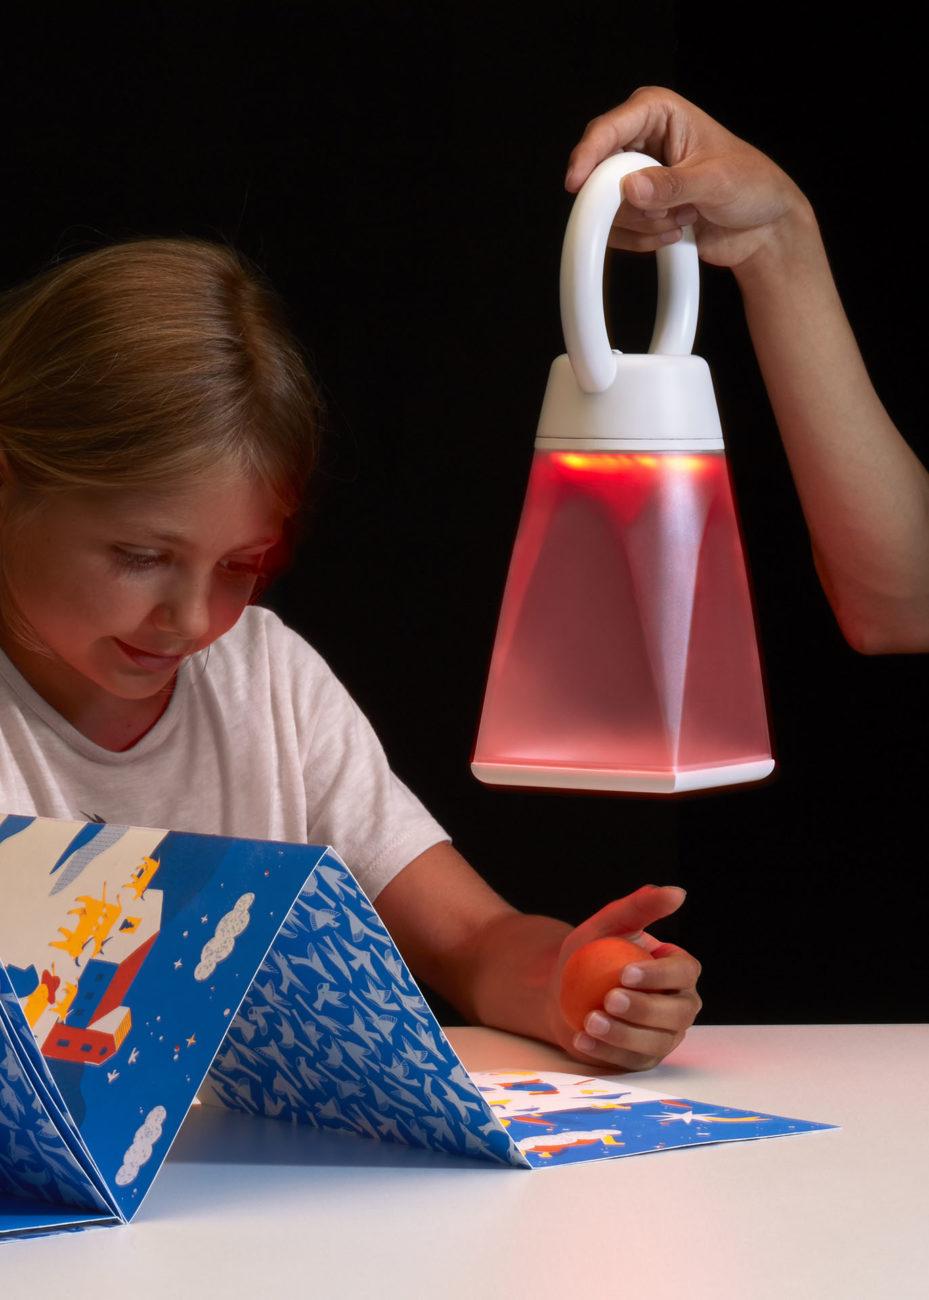 The Reading Lantern - Installation - Vincent Belet - Tammara Leites - Jiajun Zheng - Mirage Festival